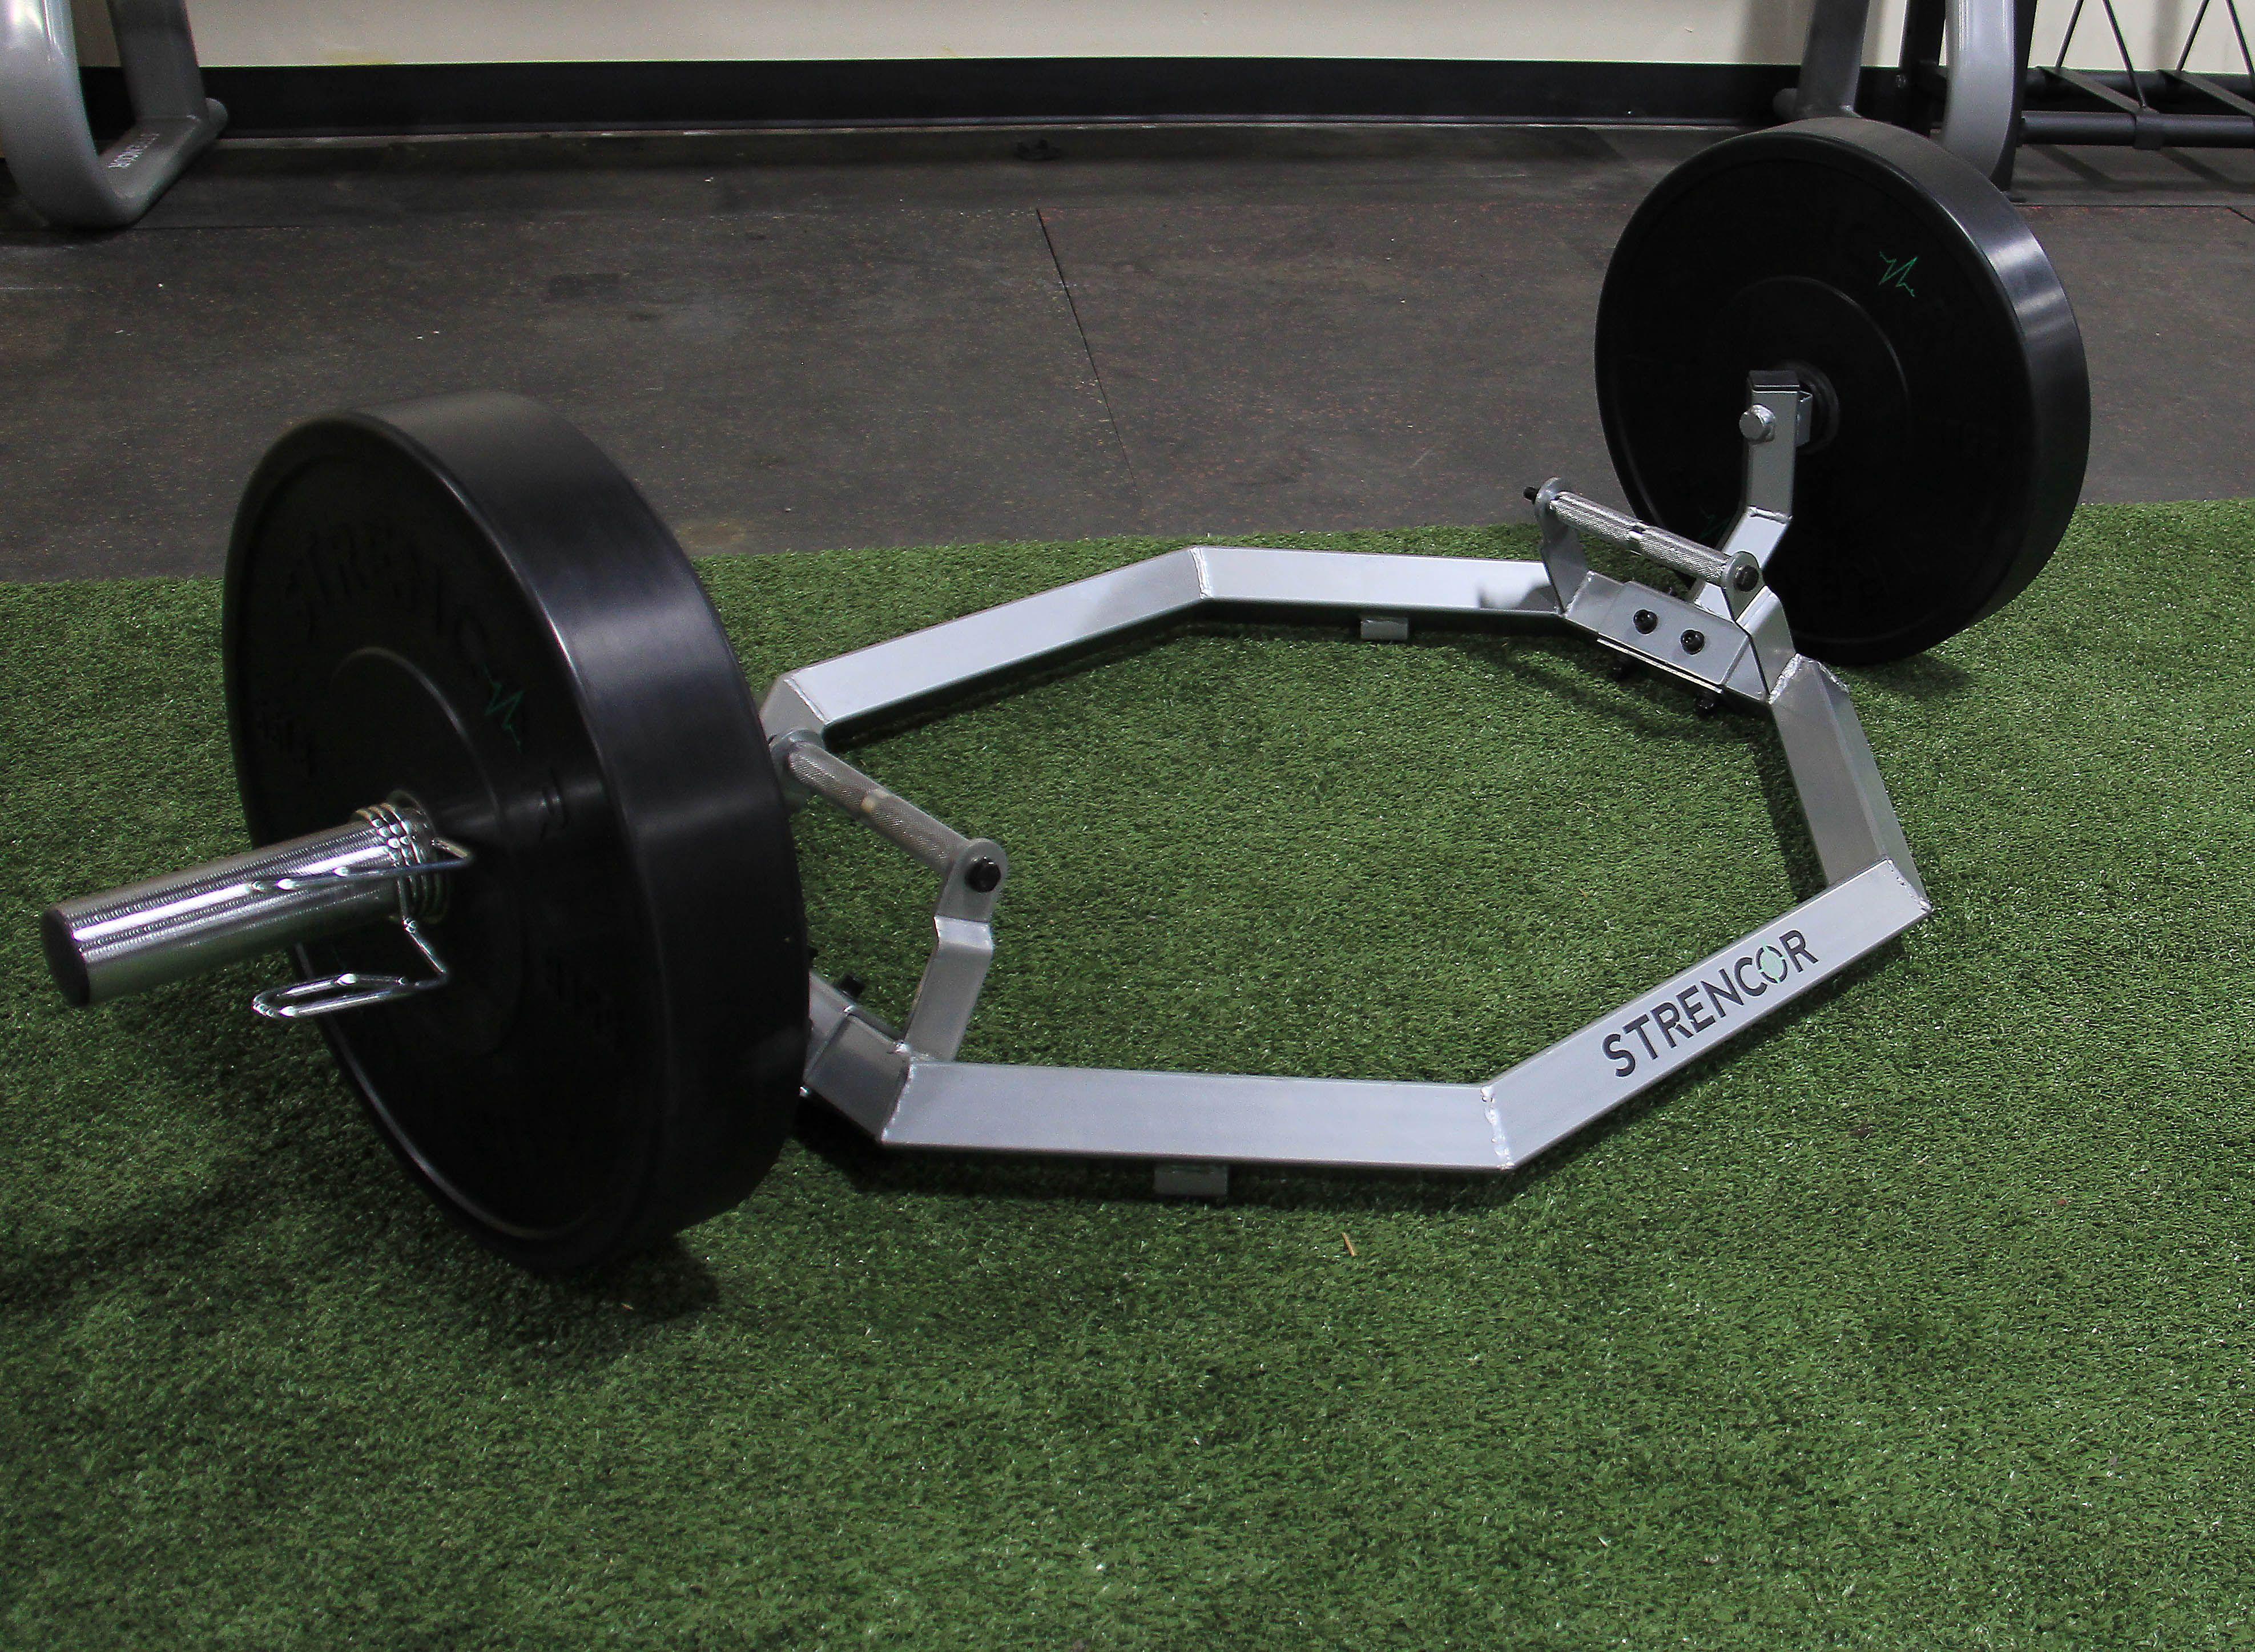 Strencor Bolt Together Hex Bar Deadlift Crossfit Equipment Gym Design